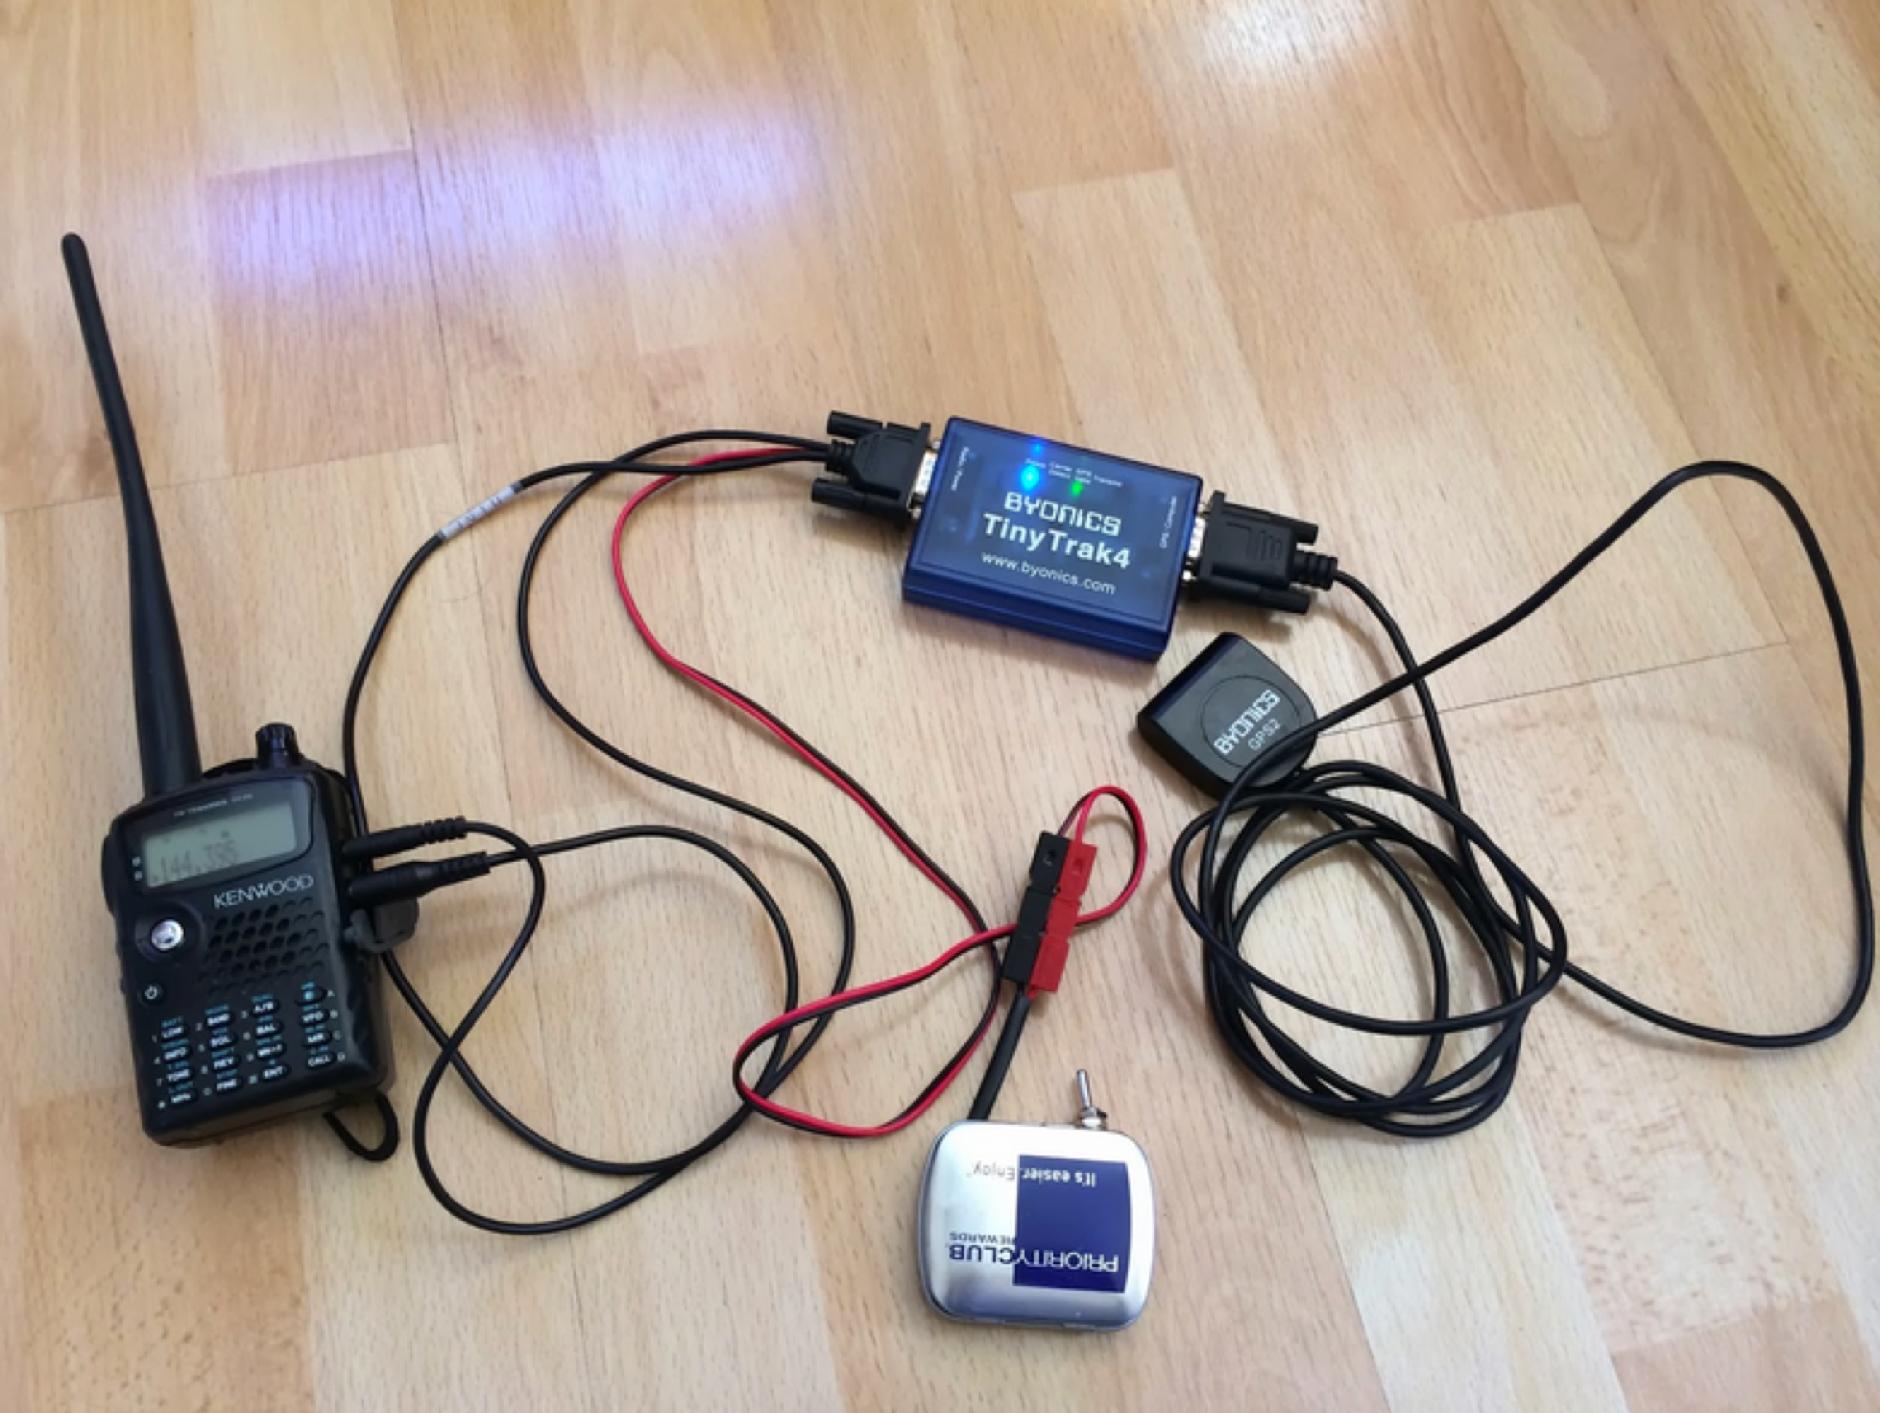 DXZone A battery for the Byonics TinyTrak4 TNC